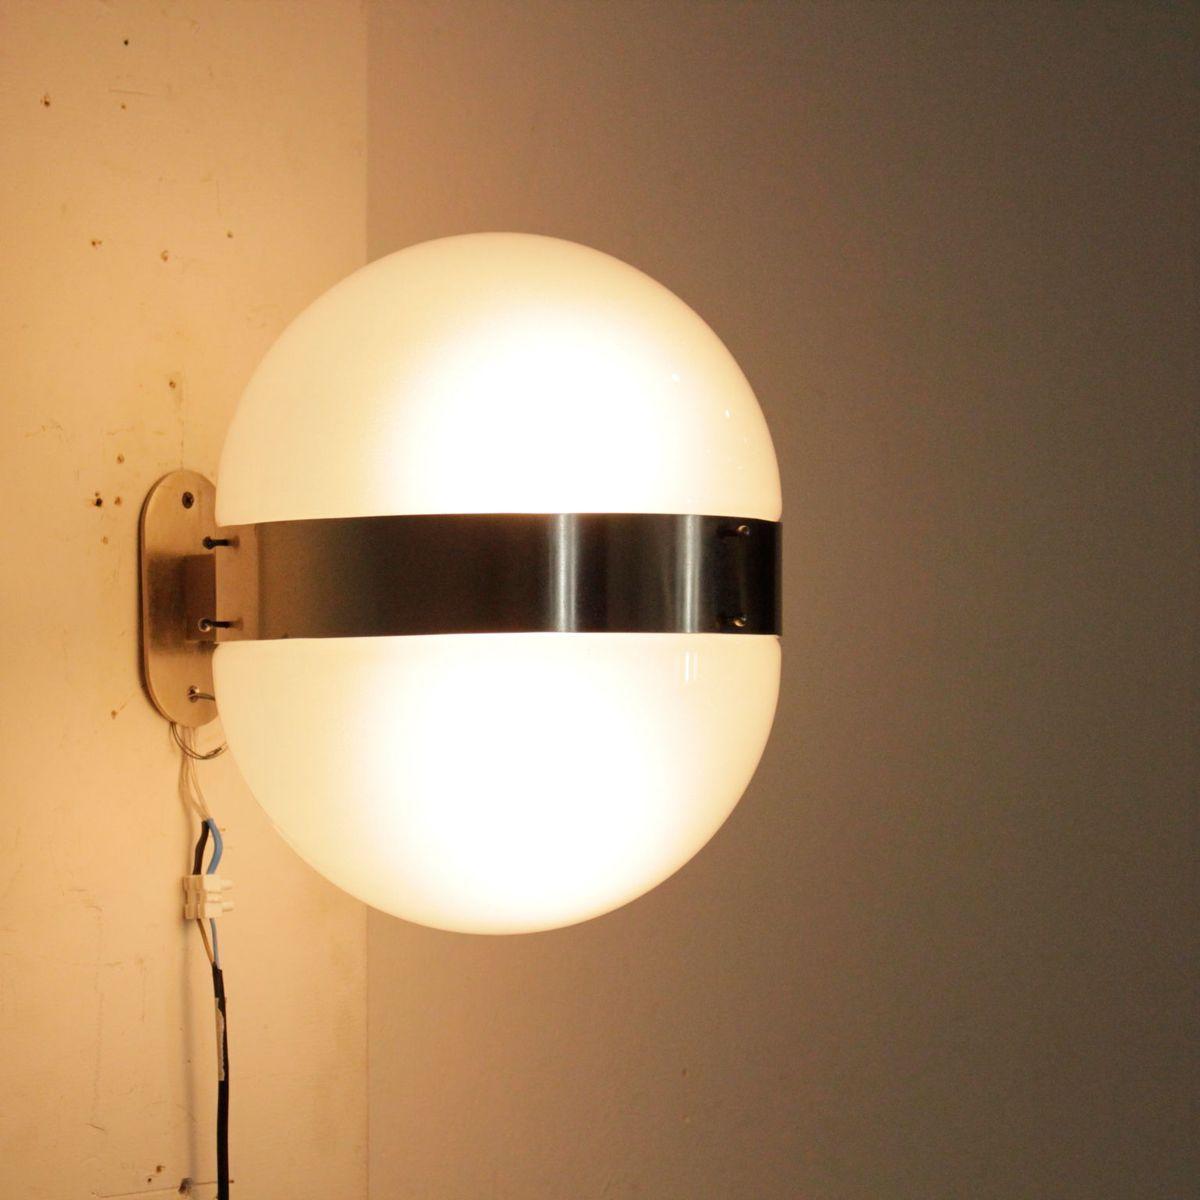 wandlampe aus verchromtem metall von sergio mazza f r. Black Bedroom Furniture Sets. Home Design Ideas